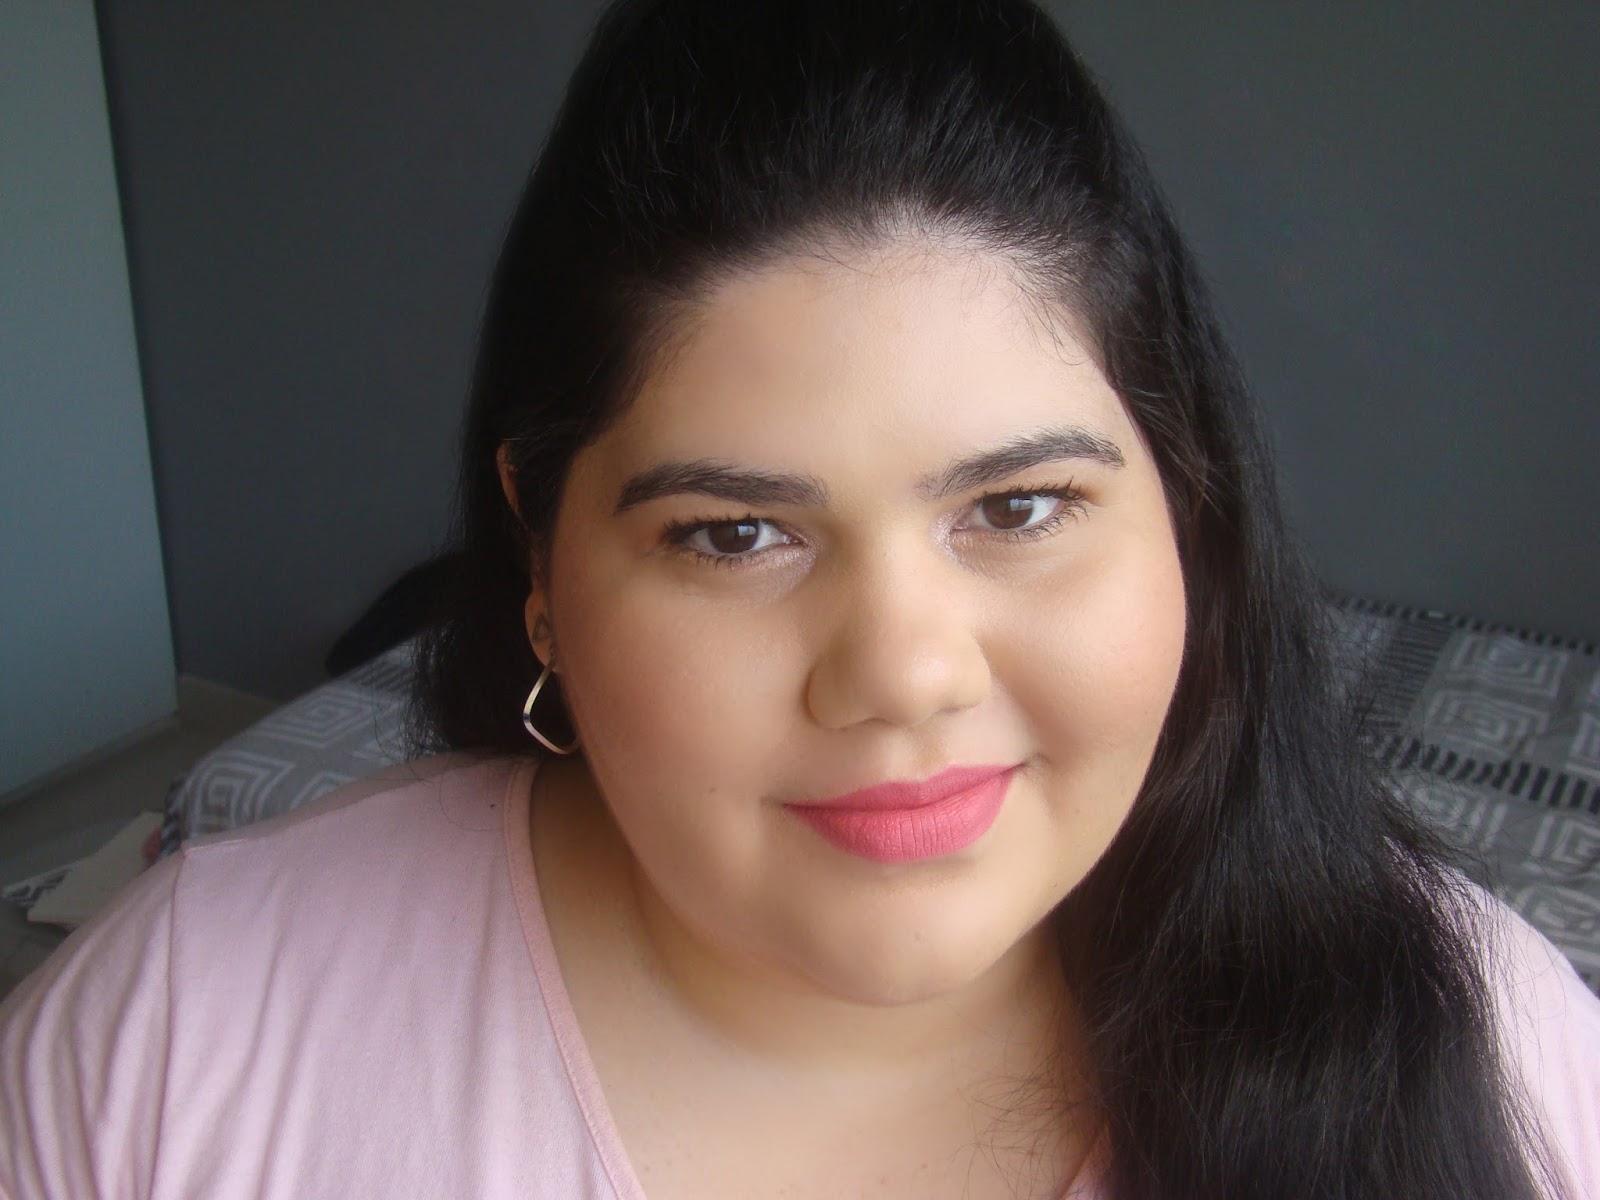 Batons Favorito  líquido cor atitude dailus pro maquiagem makeup lipstick pink lips